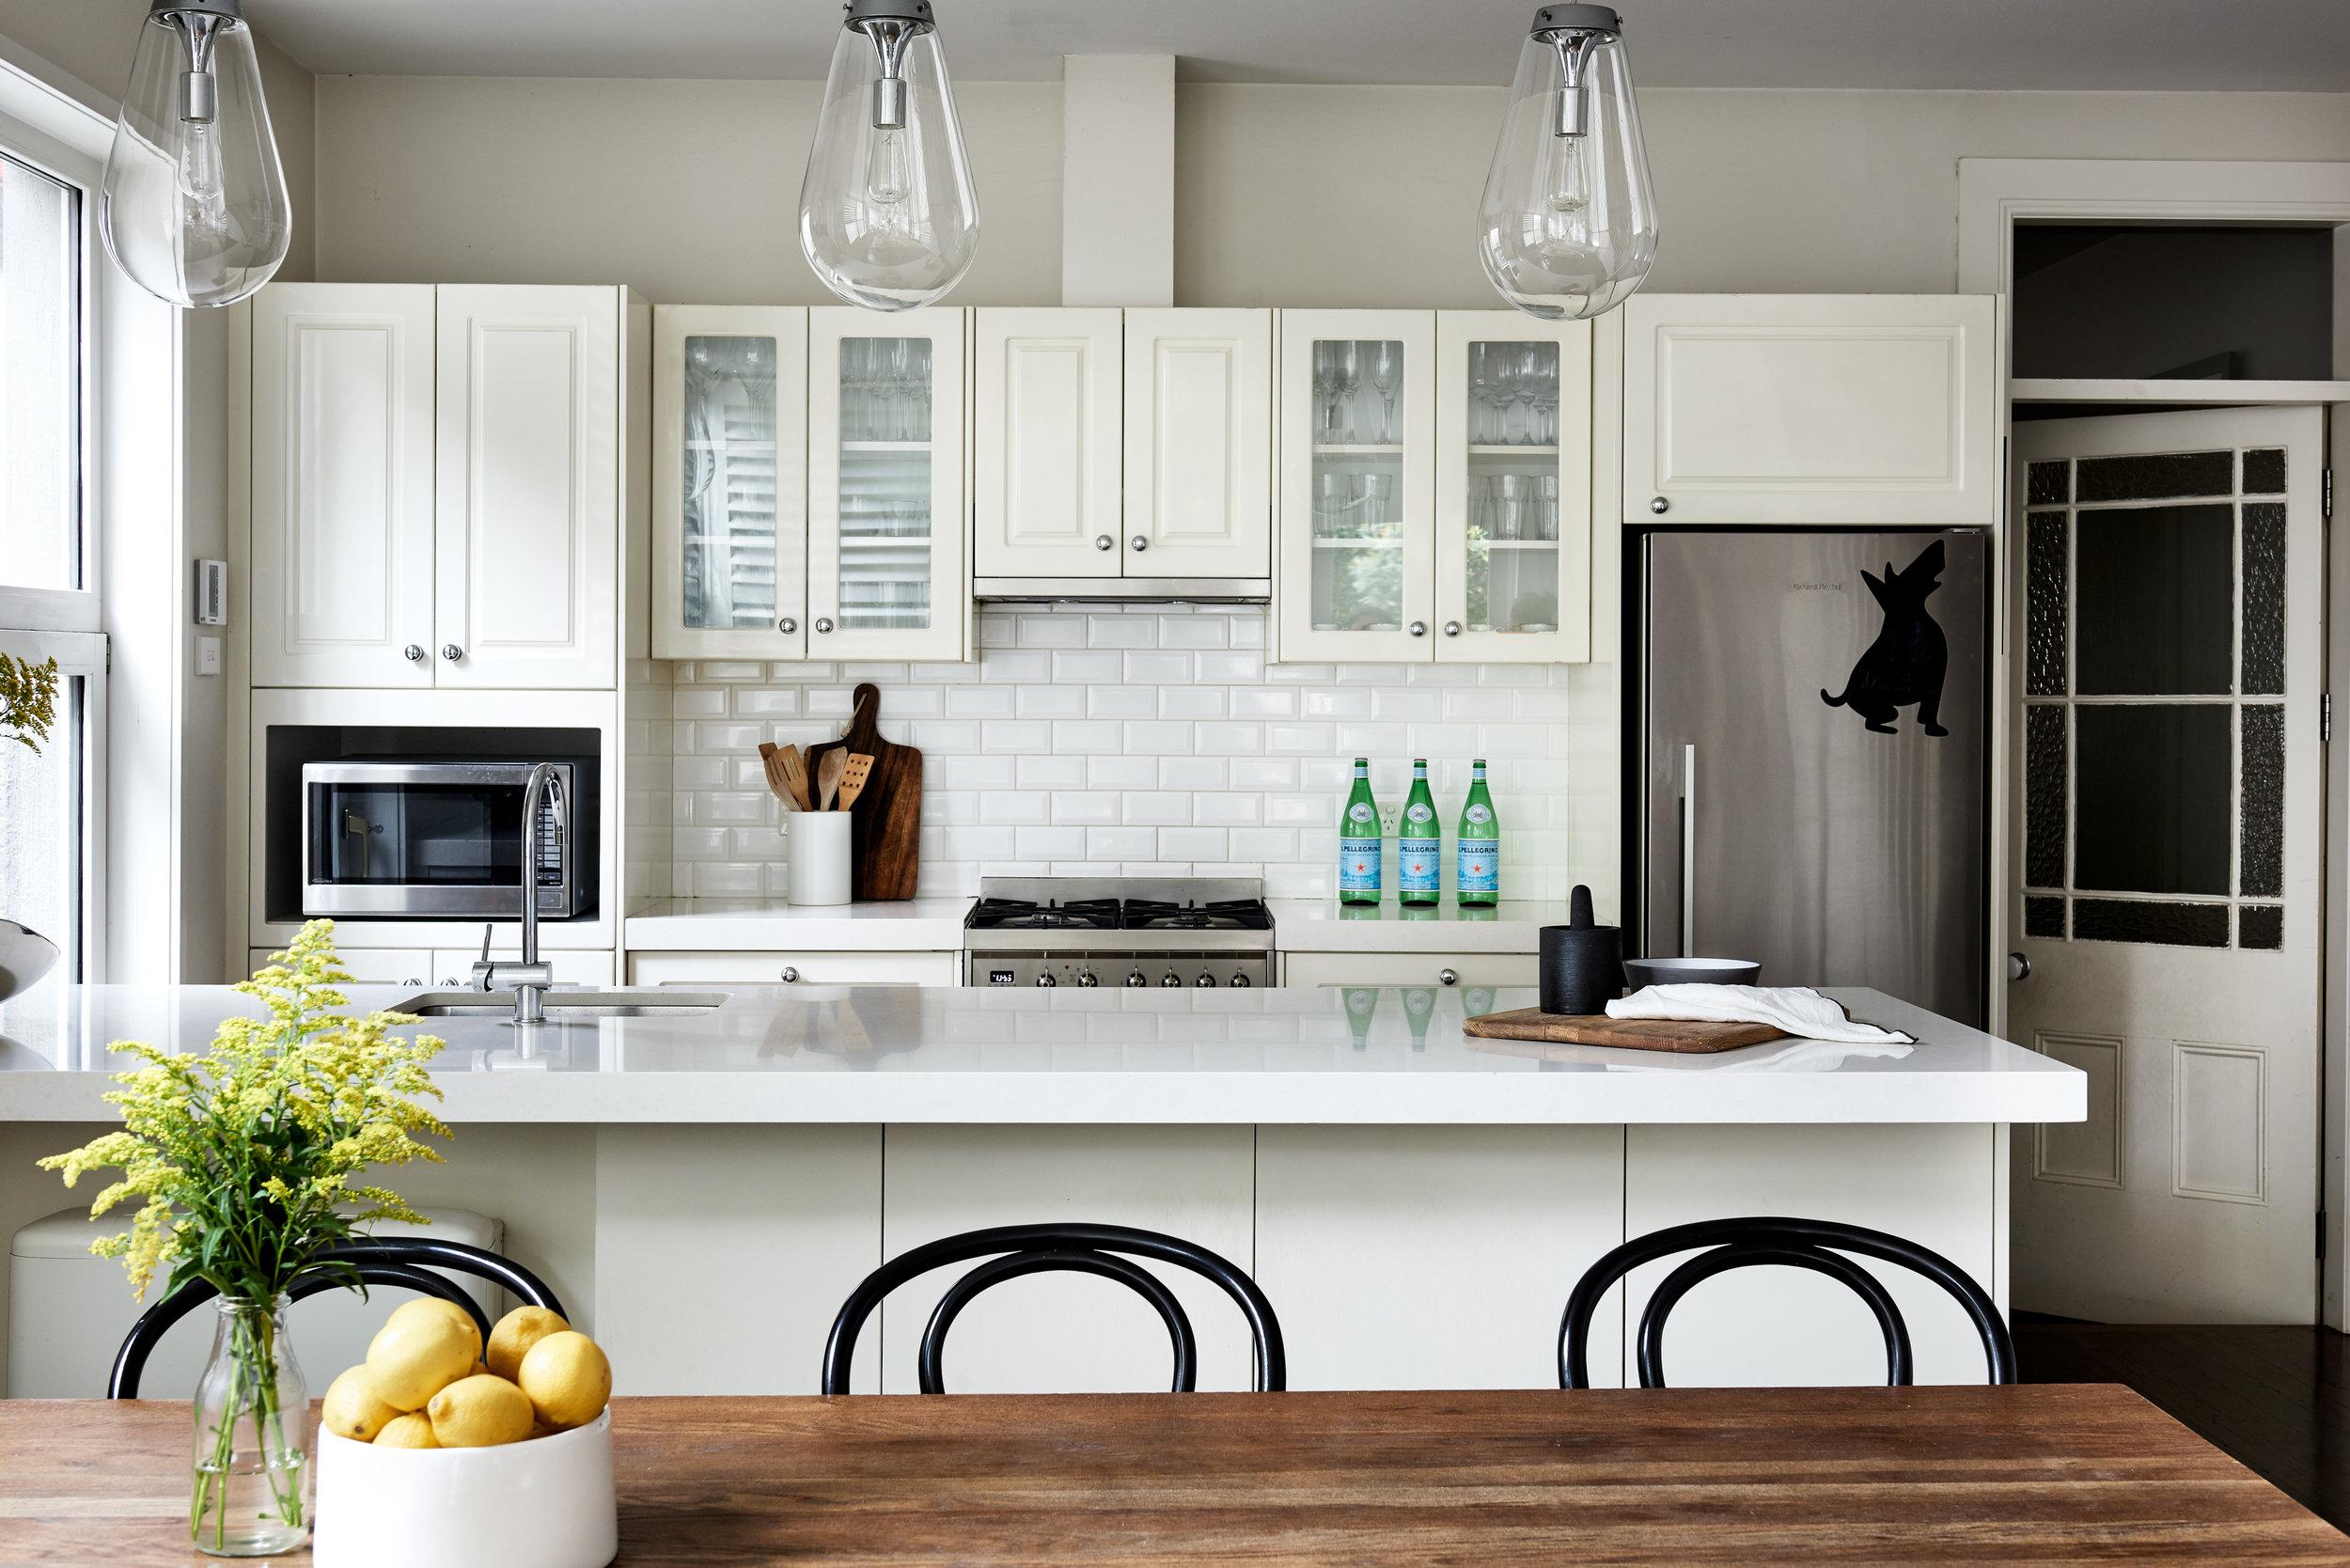 interior-decorating-Liz-Hayward-Styling-for-Sale.jpg